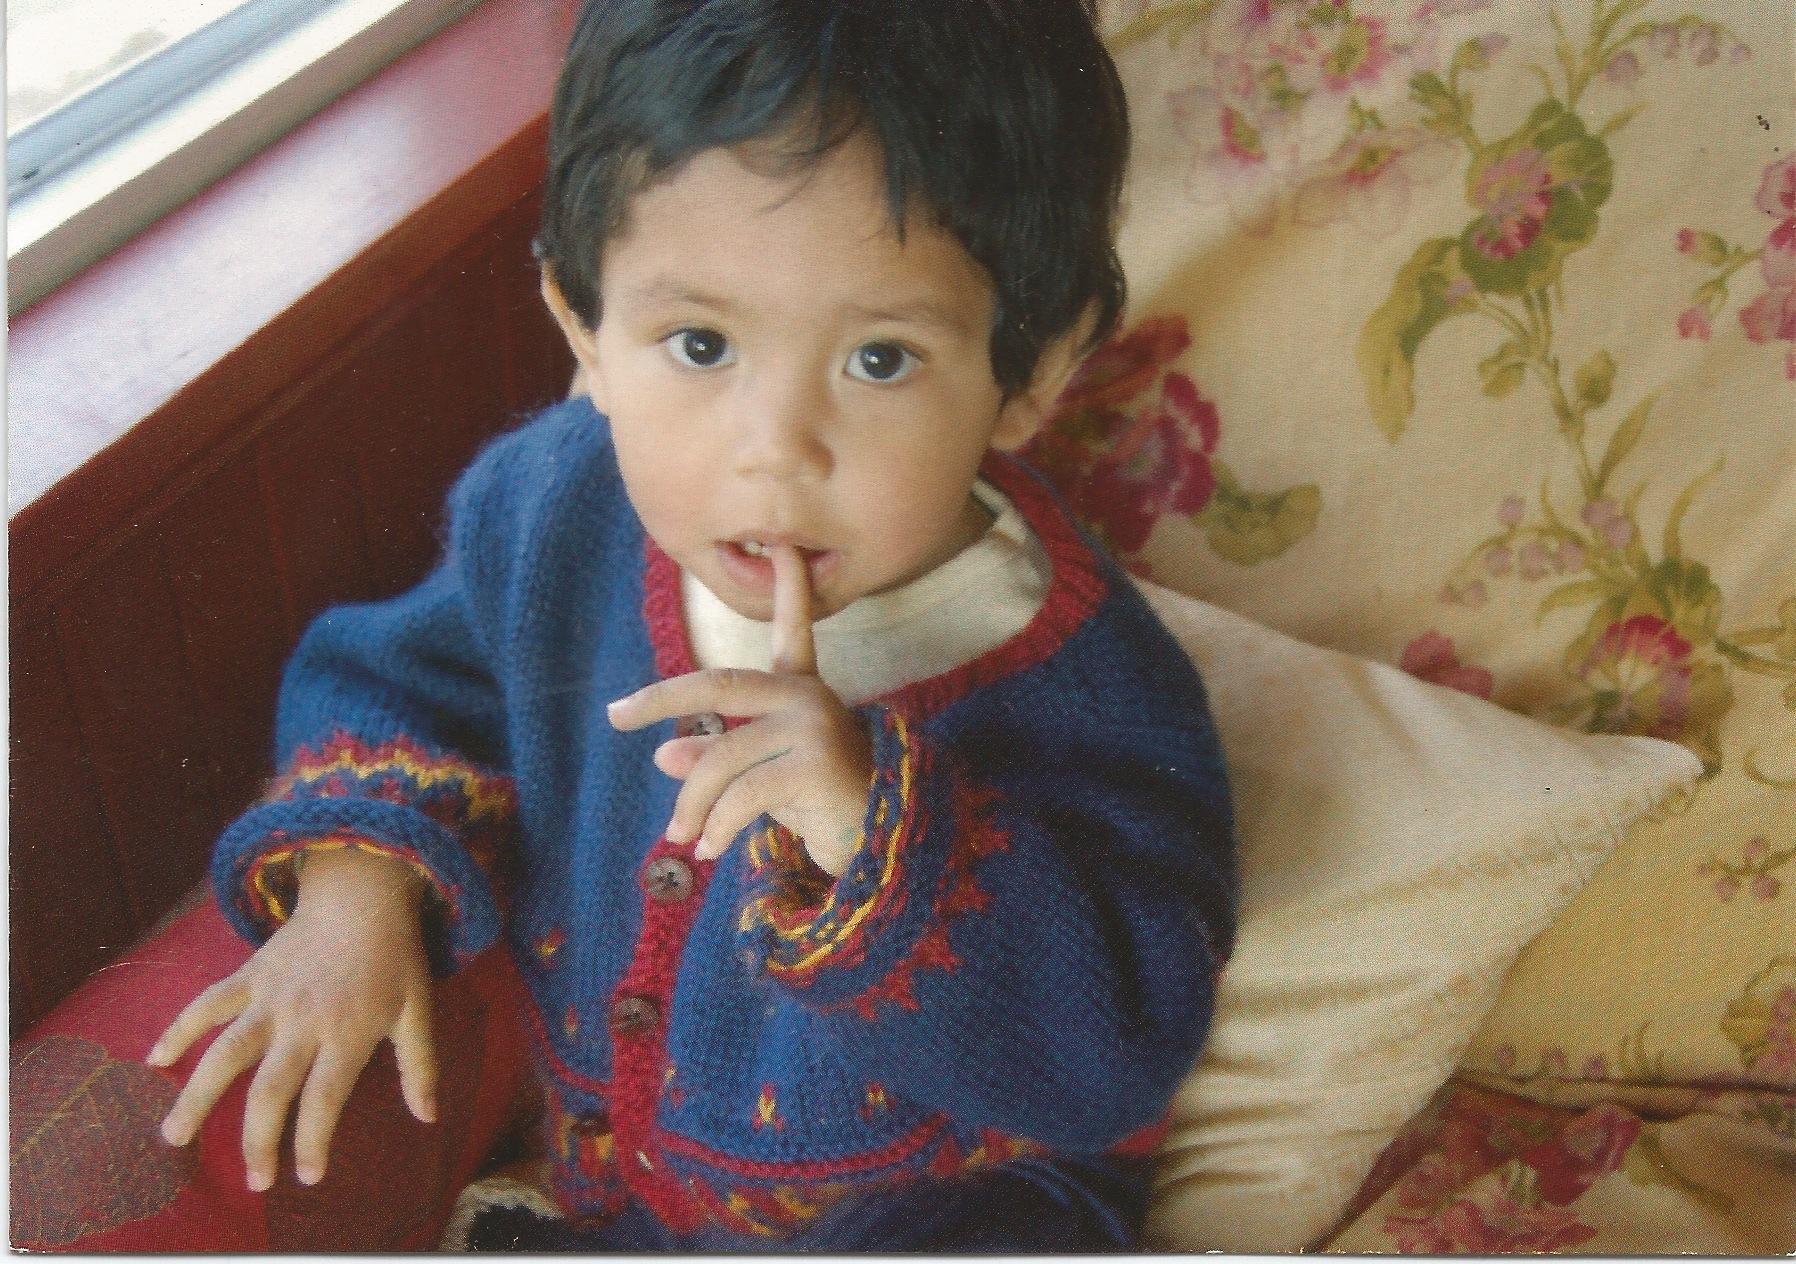 Baby Javi Sweater